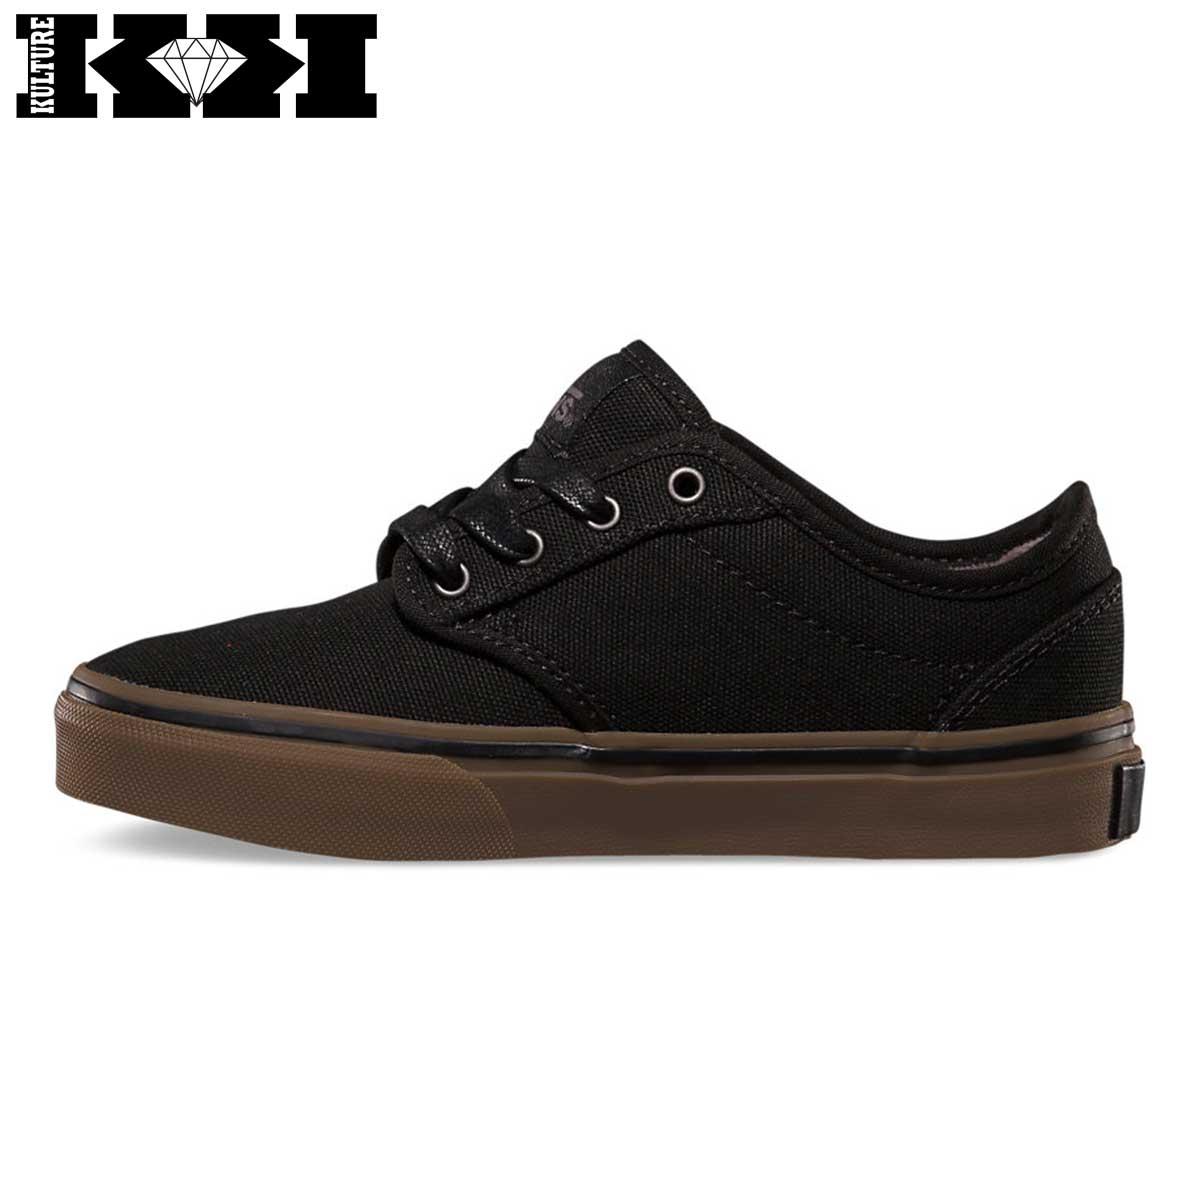 61154c737 zapatillas vans atwood